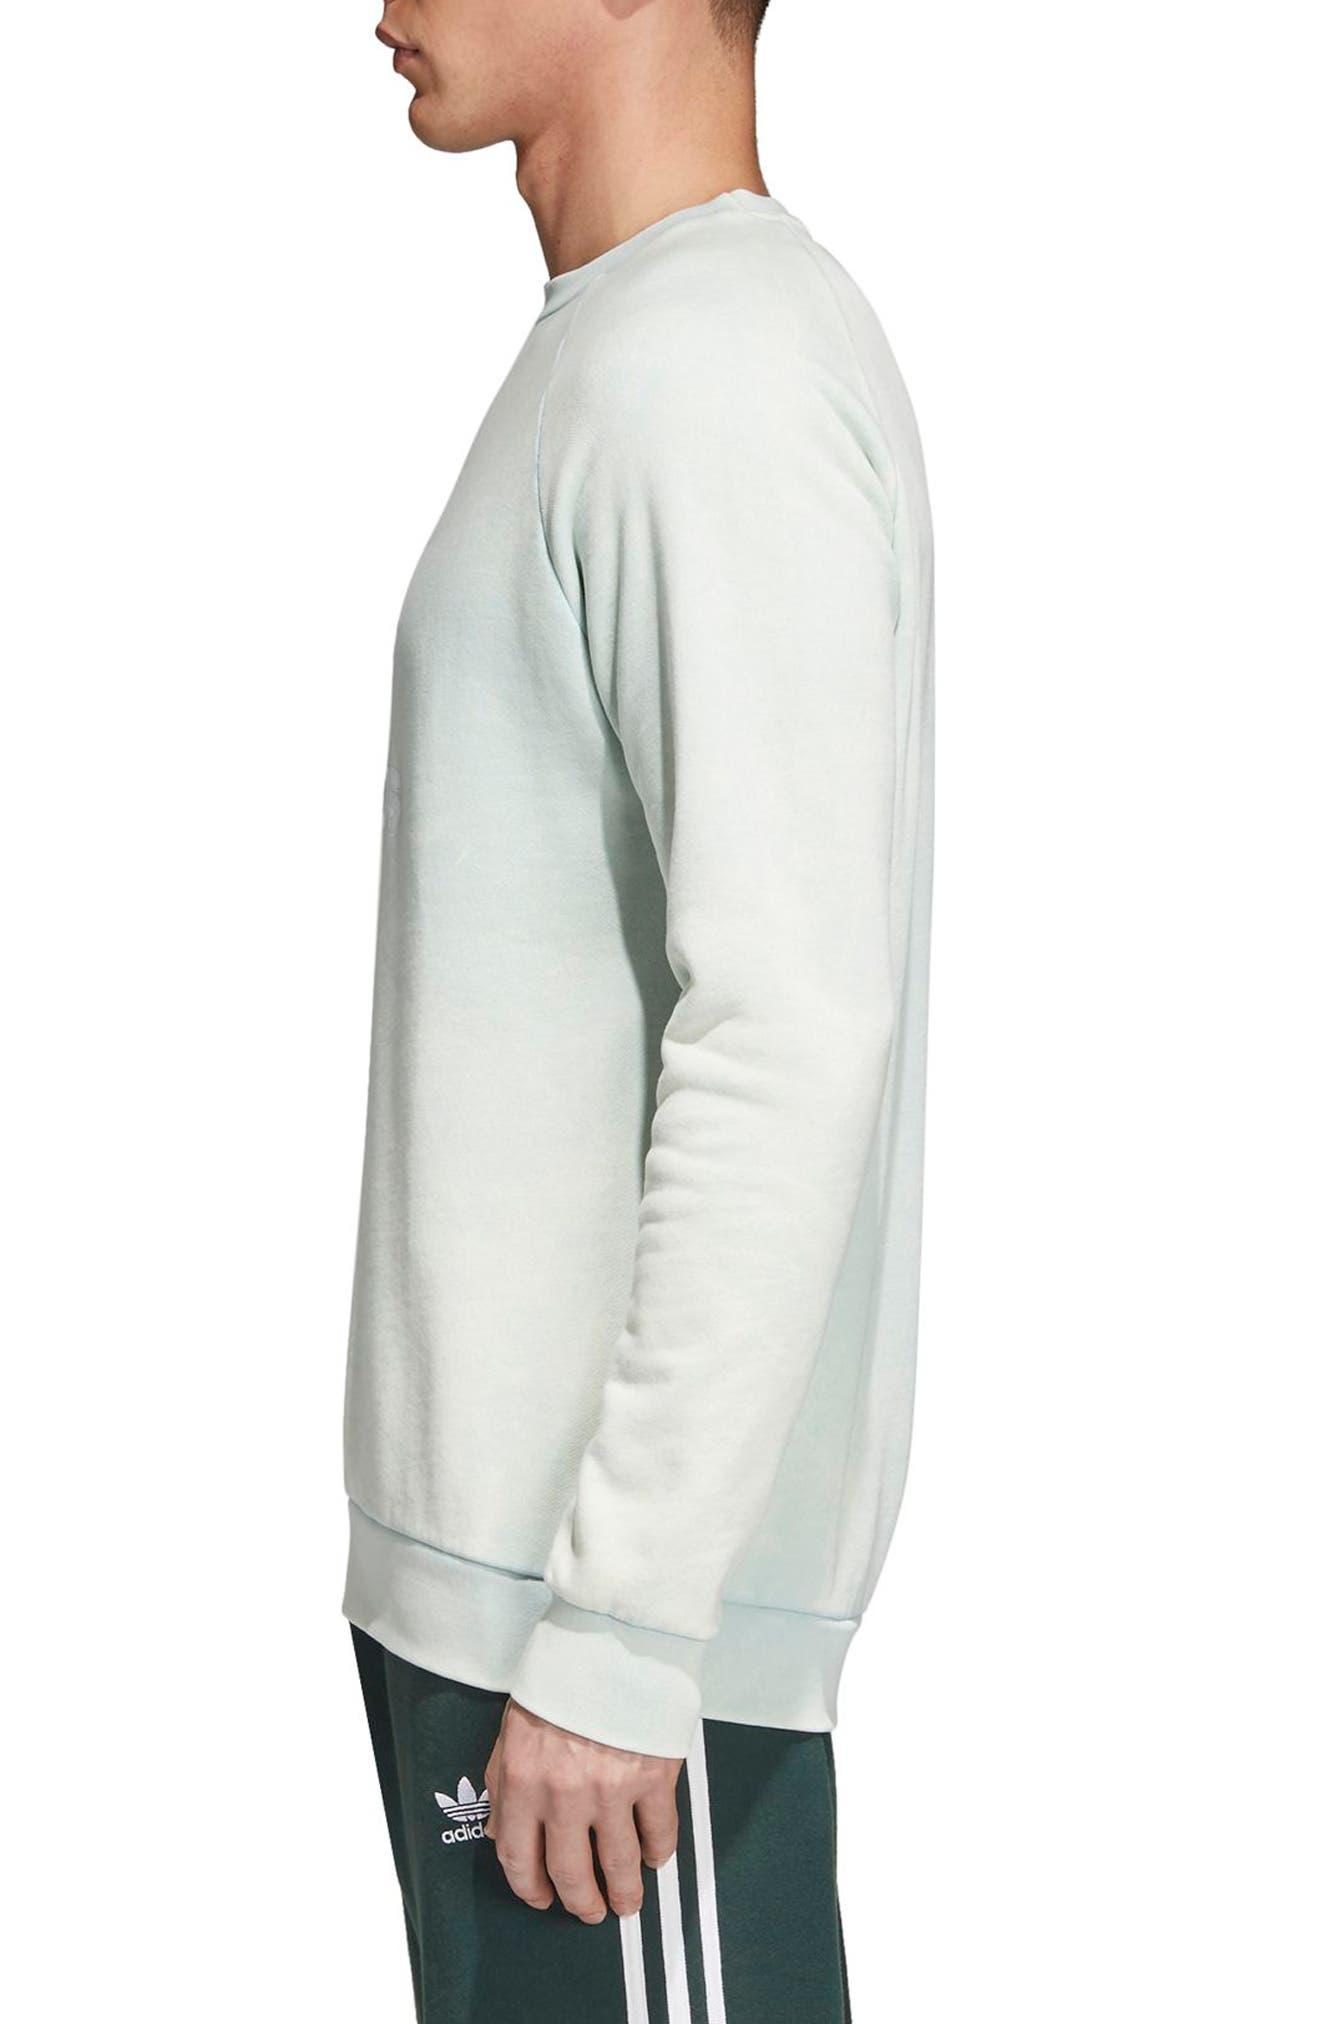 Trefoil Crewneck Sweatshirt,                             Alternate thumbnail 3, color,                             Ash Green